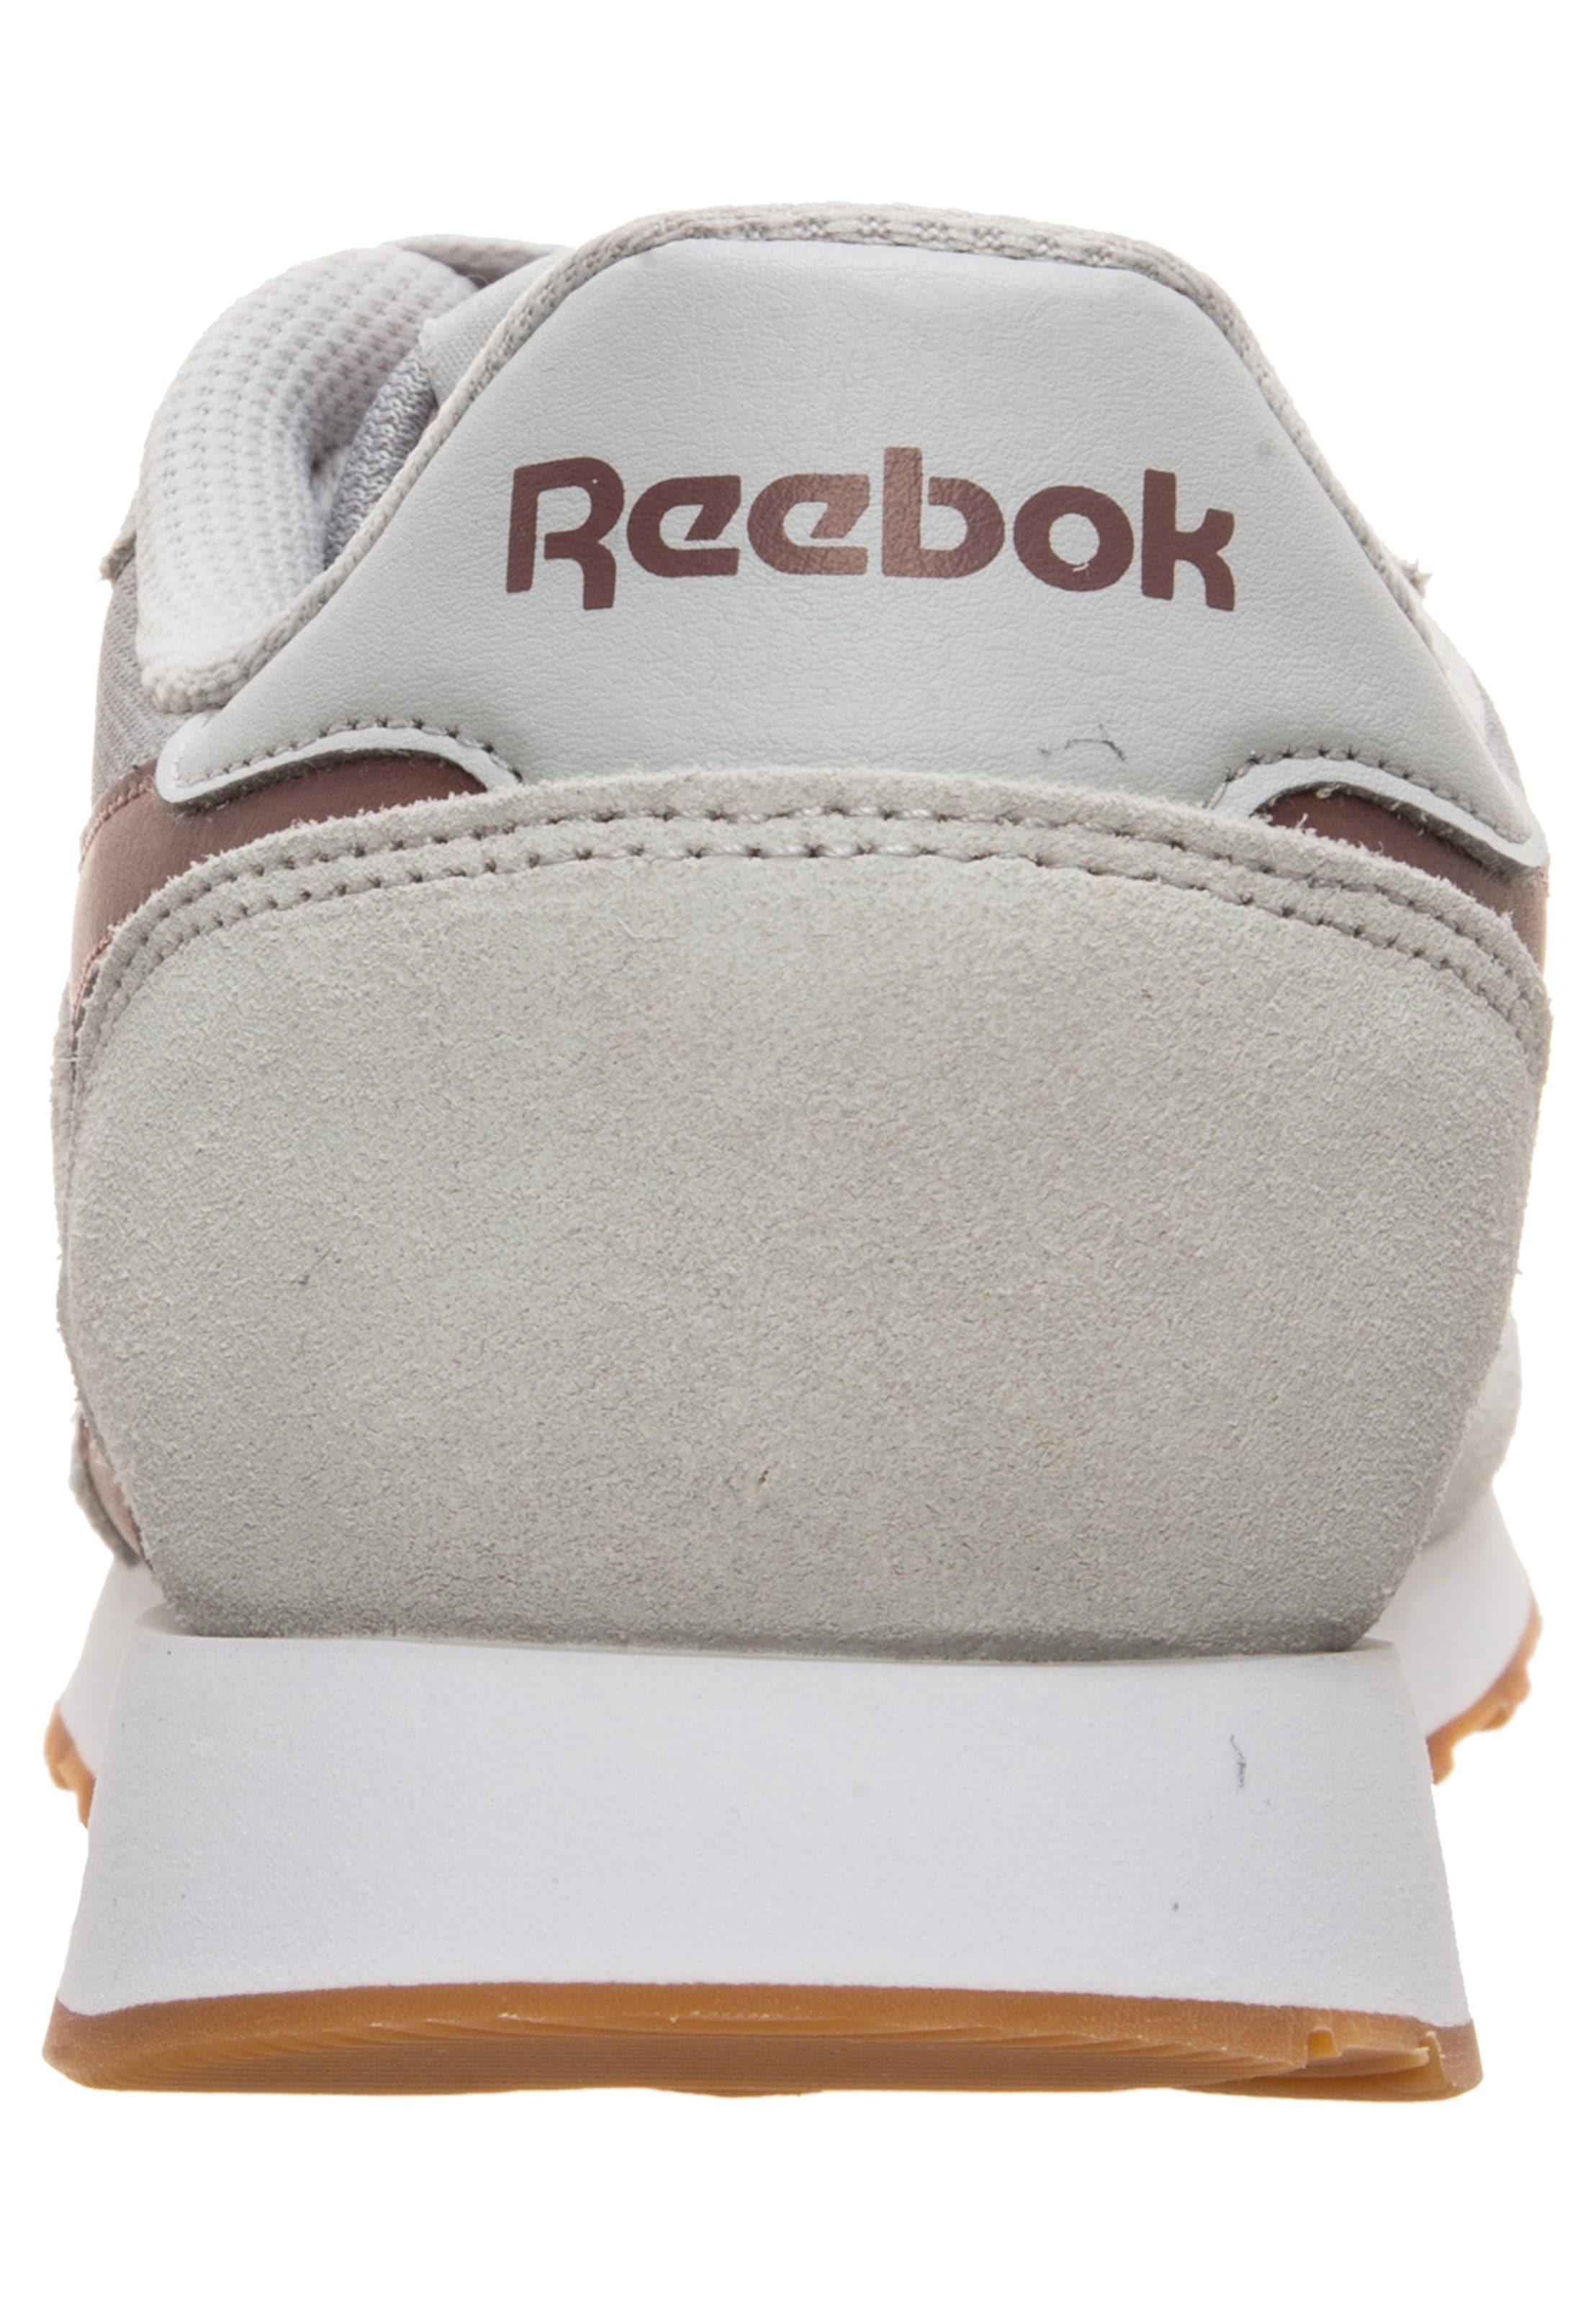 Baskets 'royal Ultra' Foncé GrisRouge Basses Reebok En Classic uJF1c5lTK3